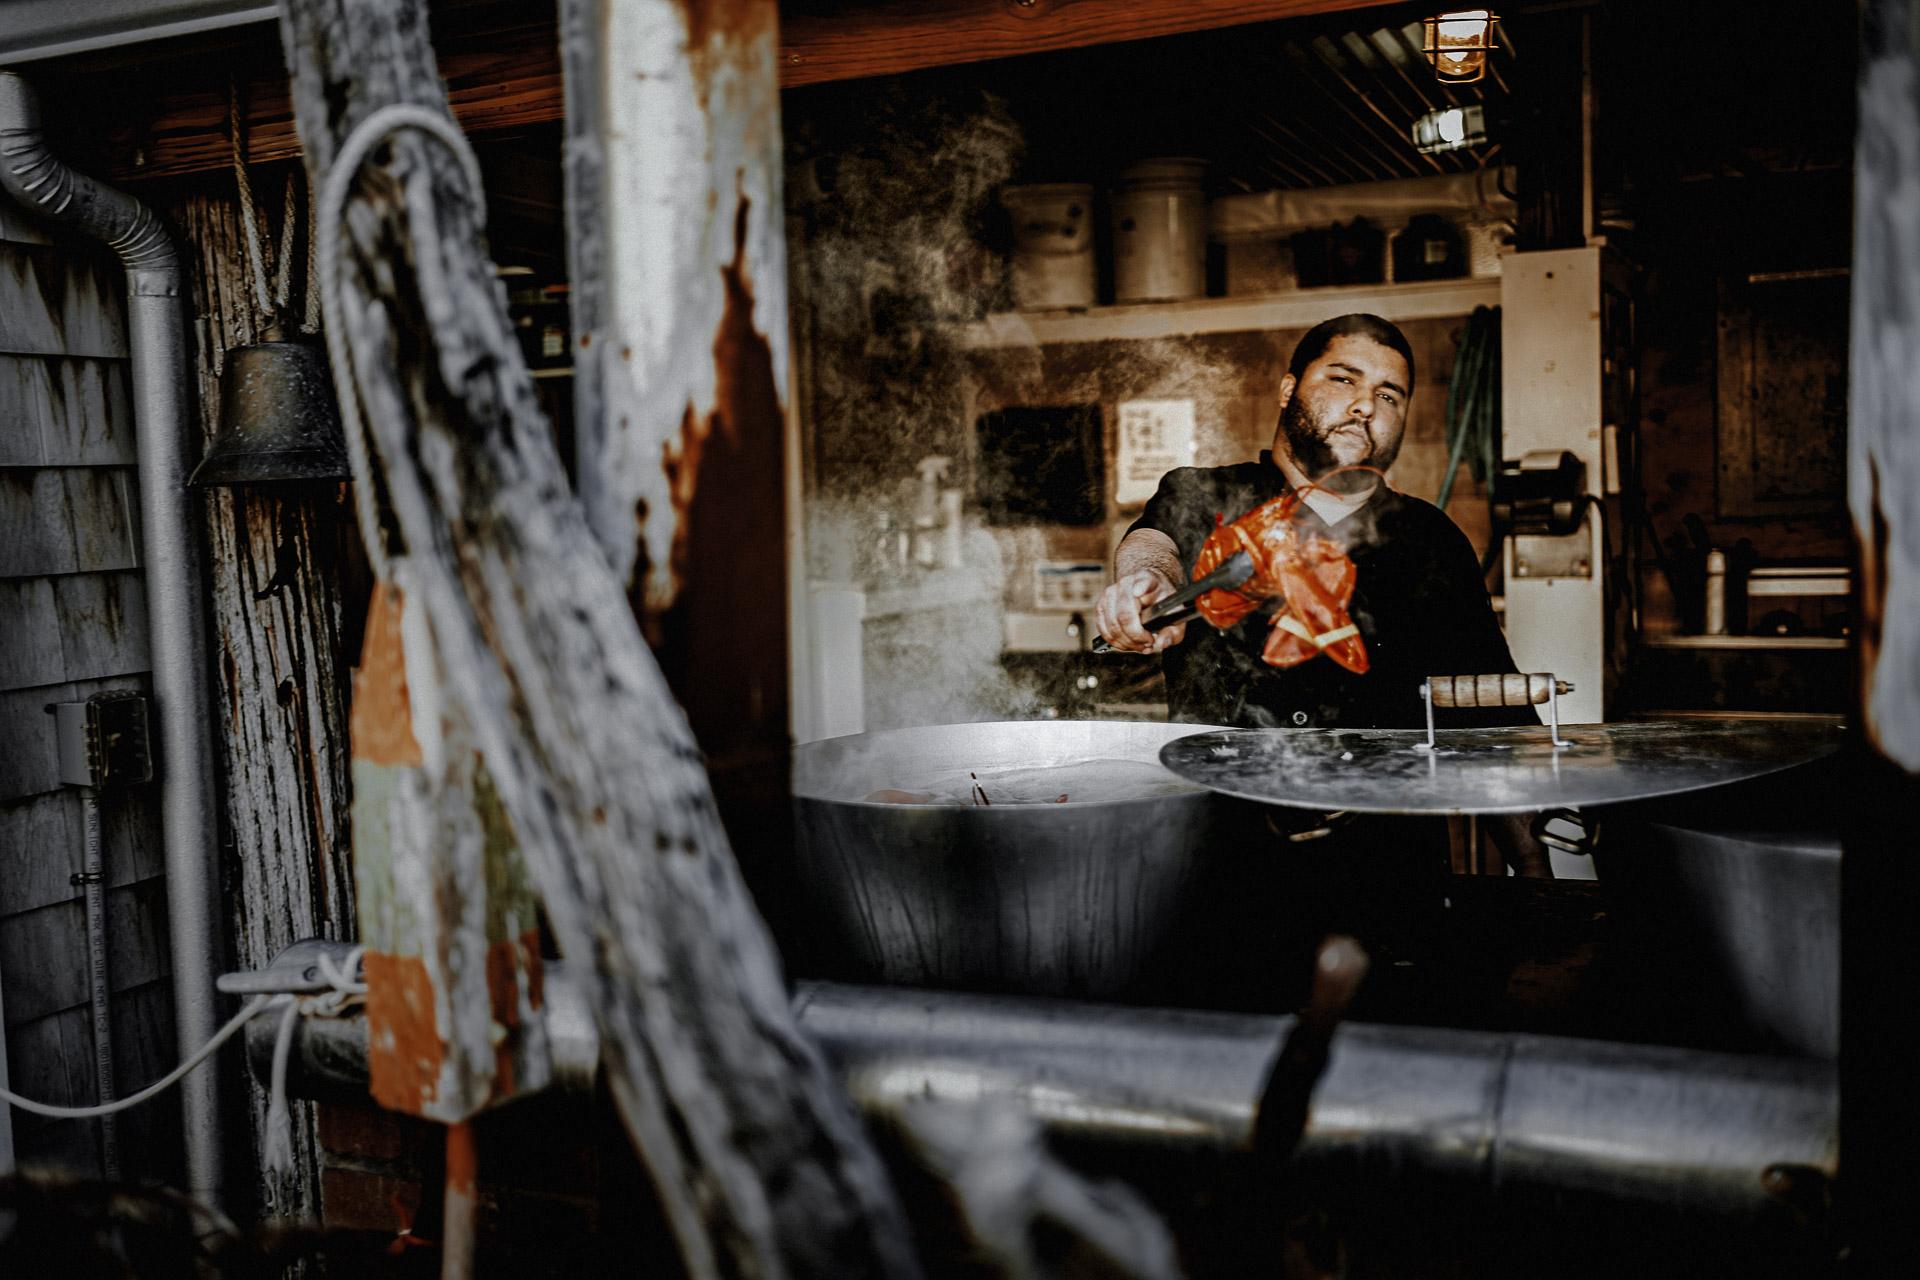 Twisted-oaks-studio-maine-bar-harbor-2019-13.jpg